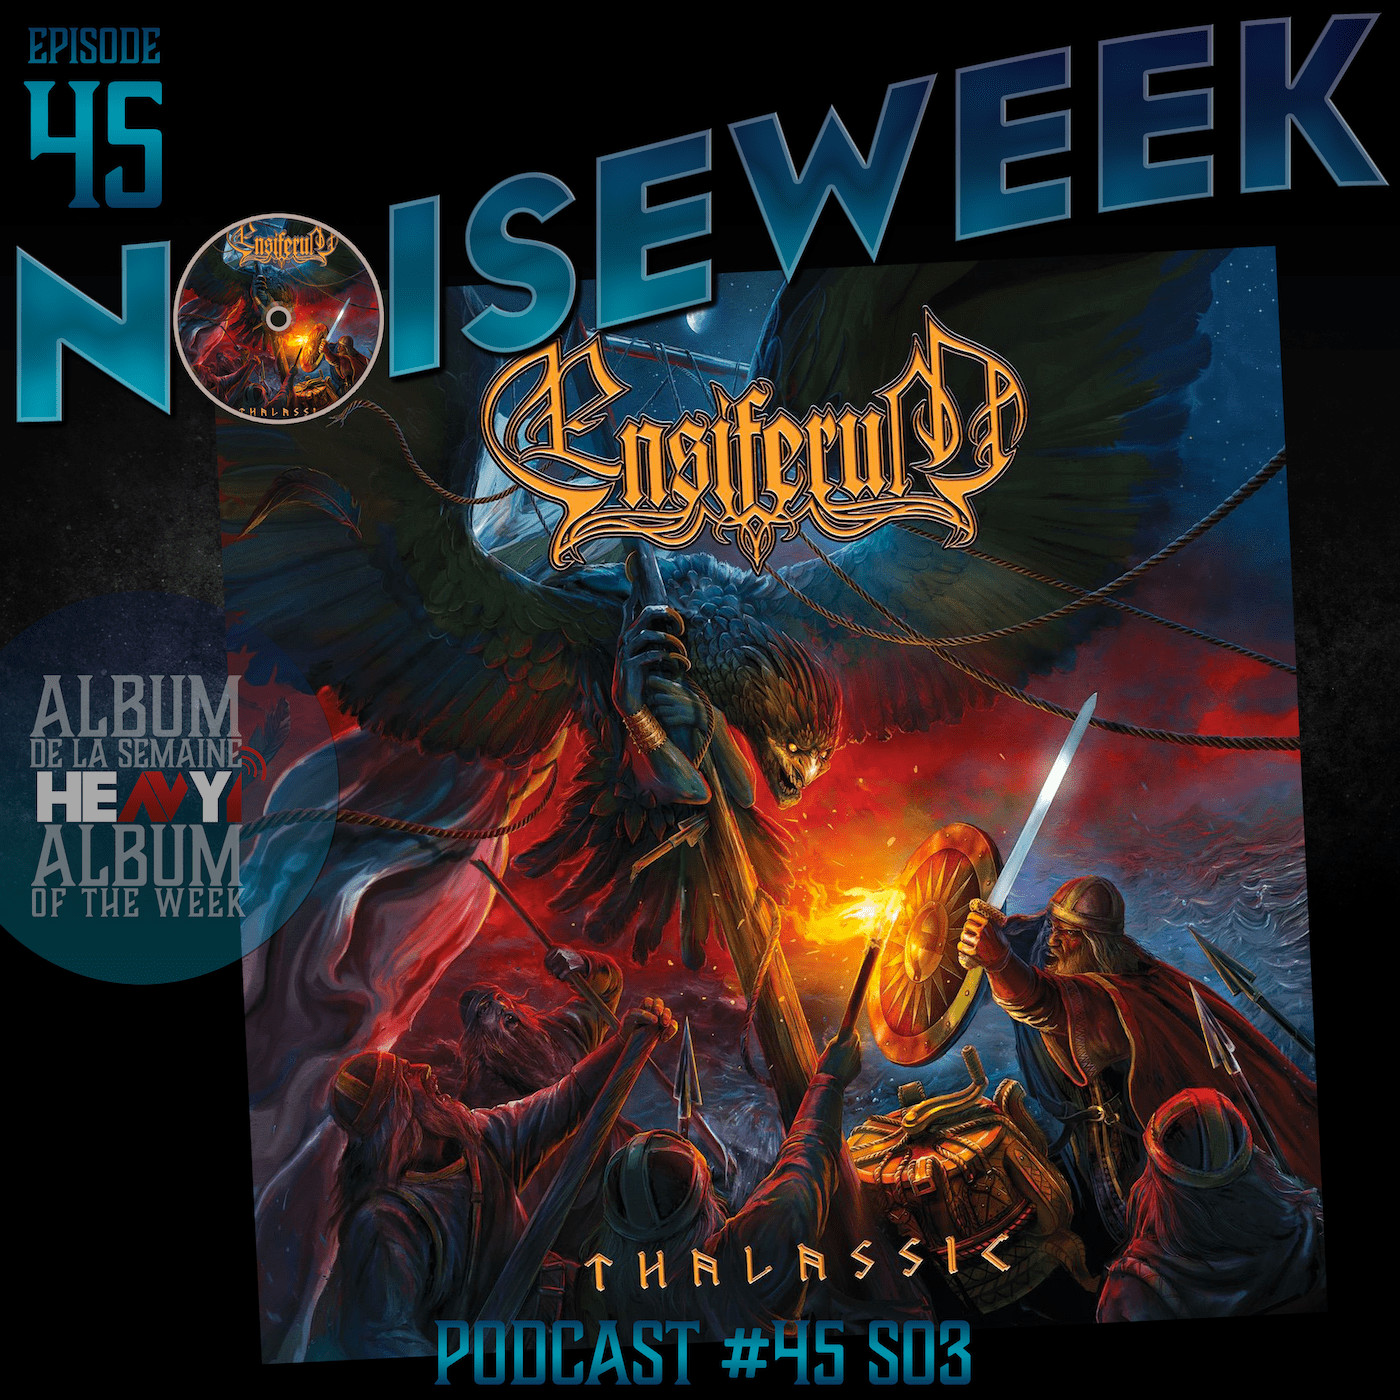 Noiseweek #45 Saison 3